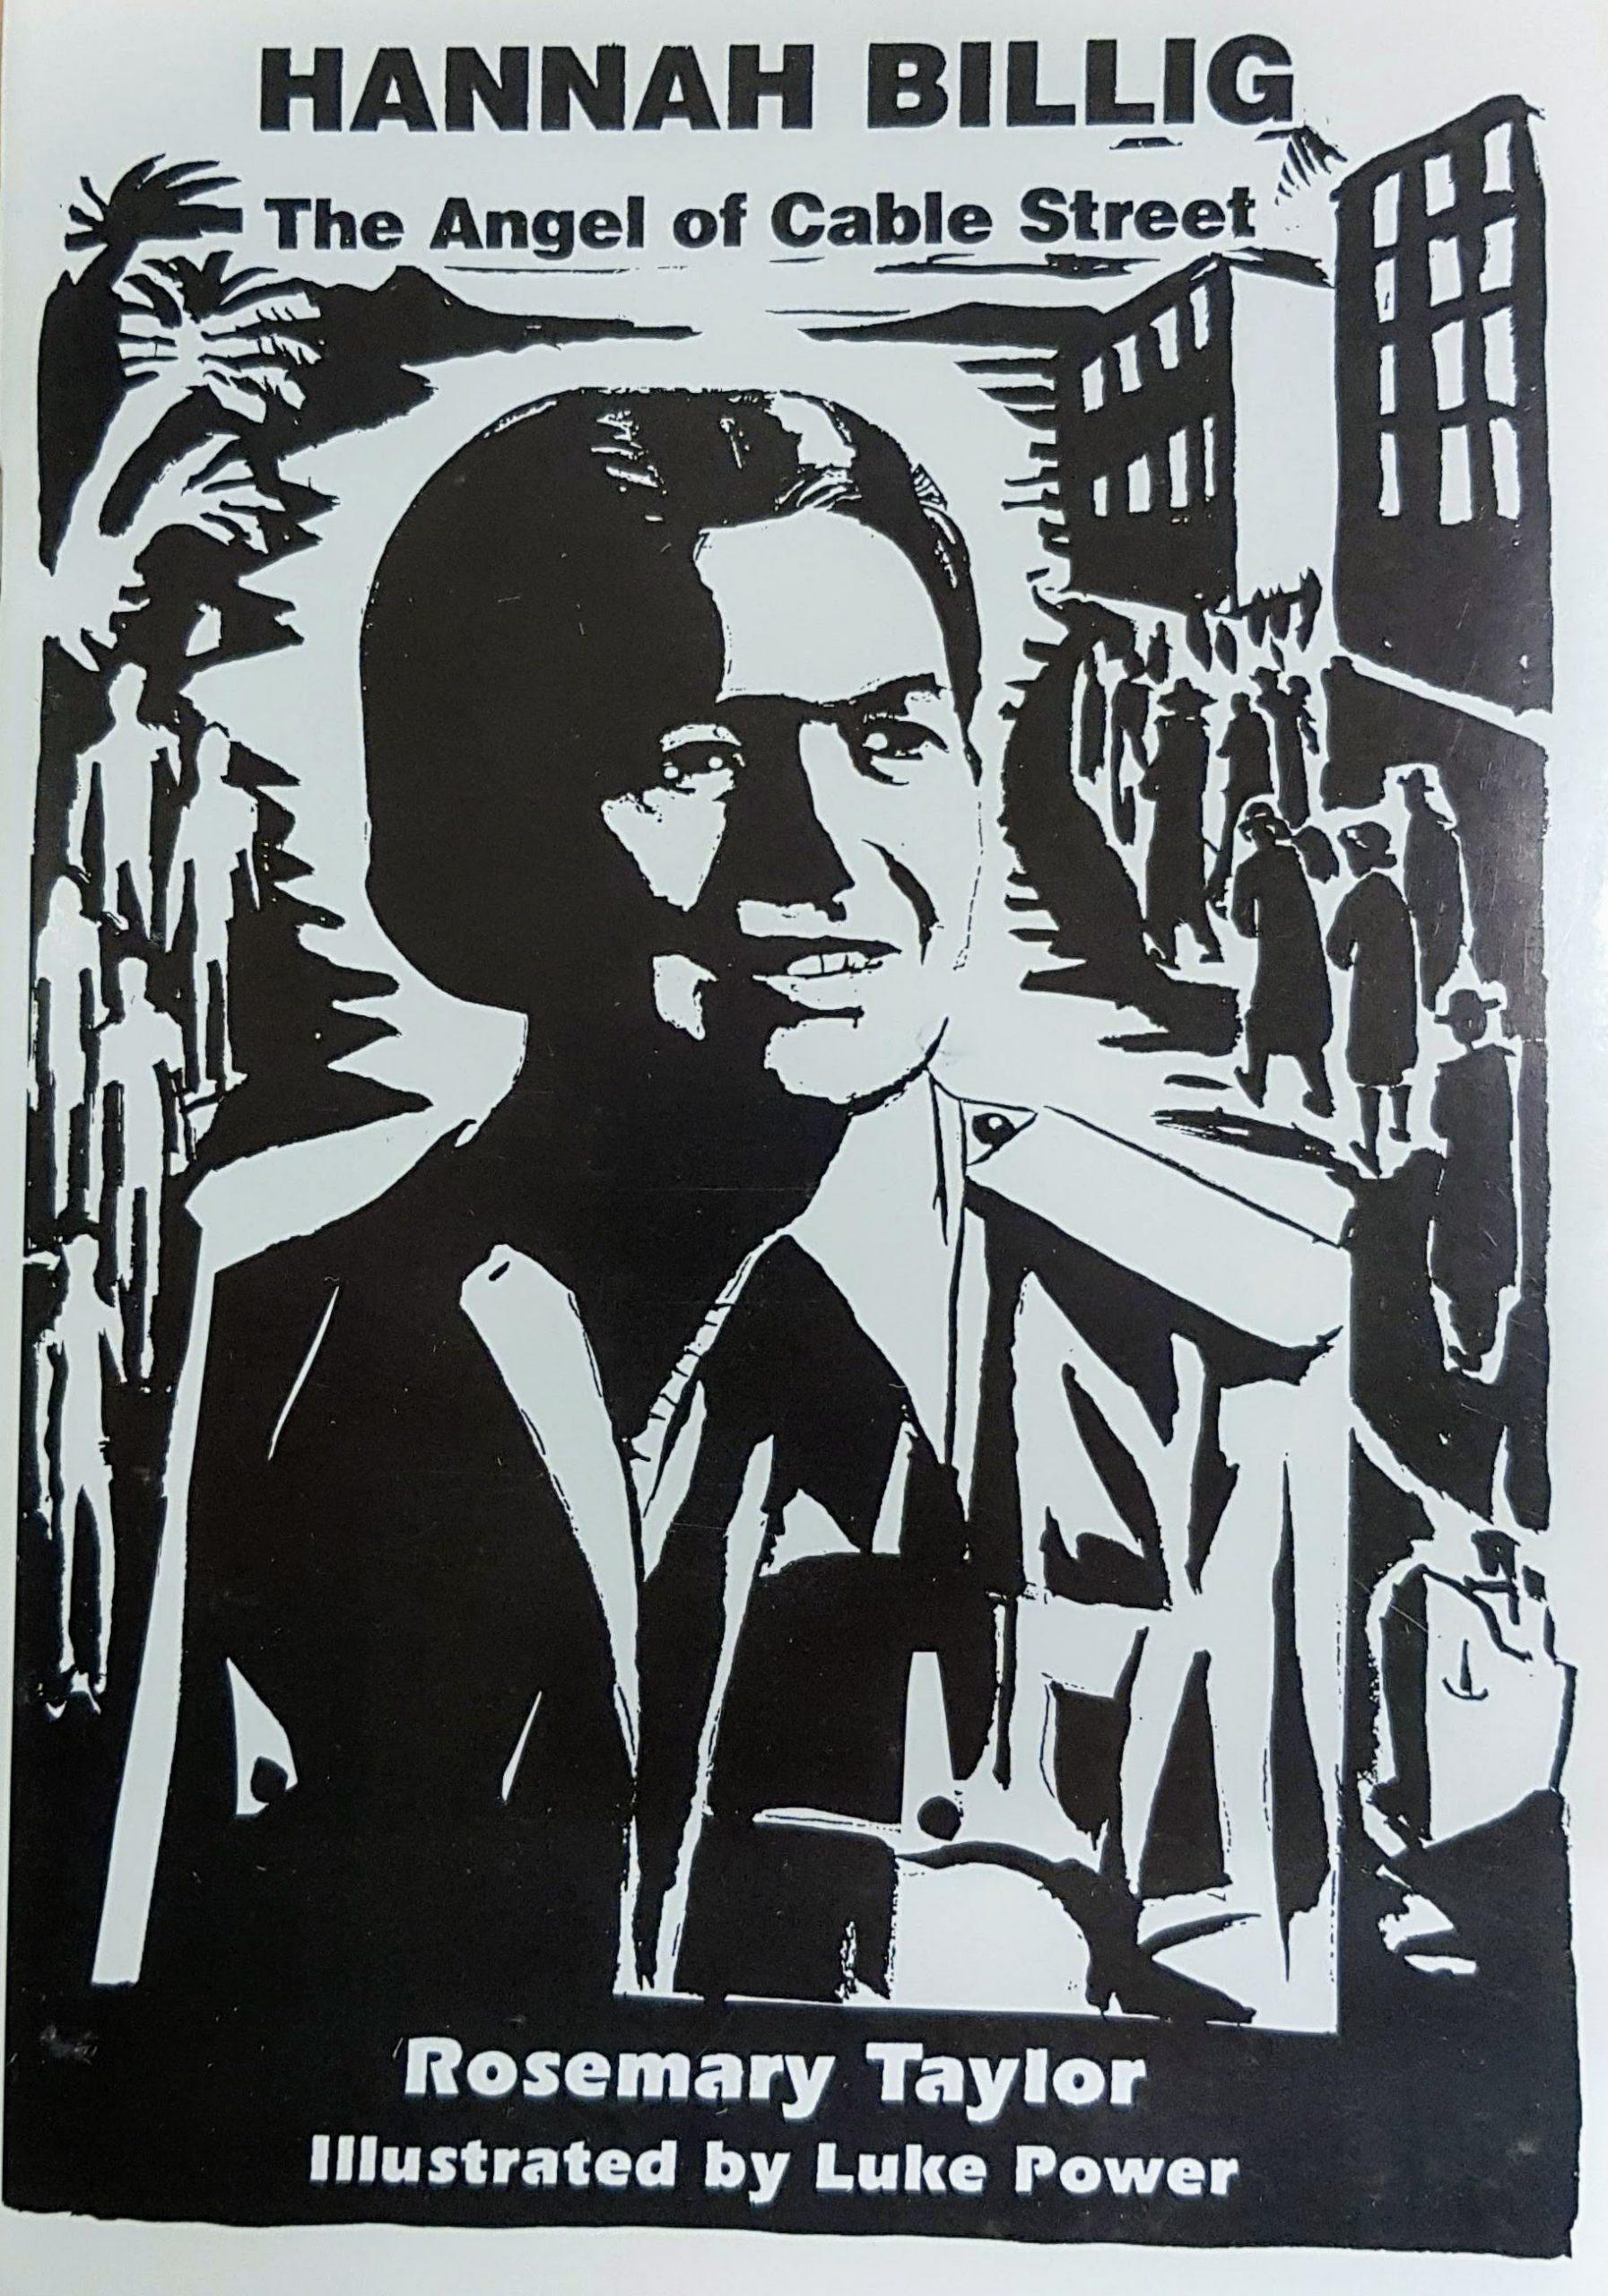 Hannah Billig booklet cover